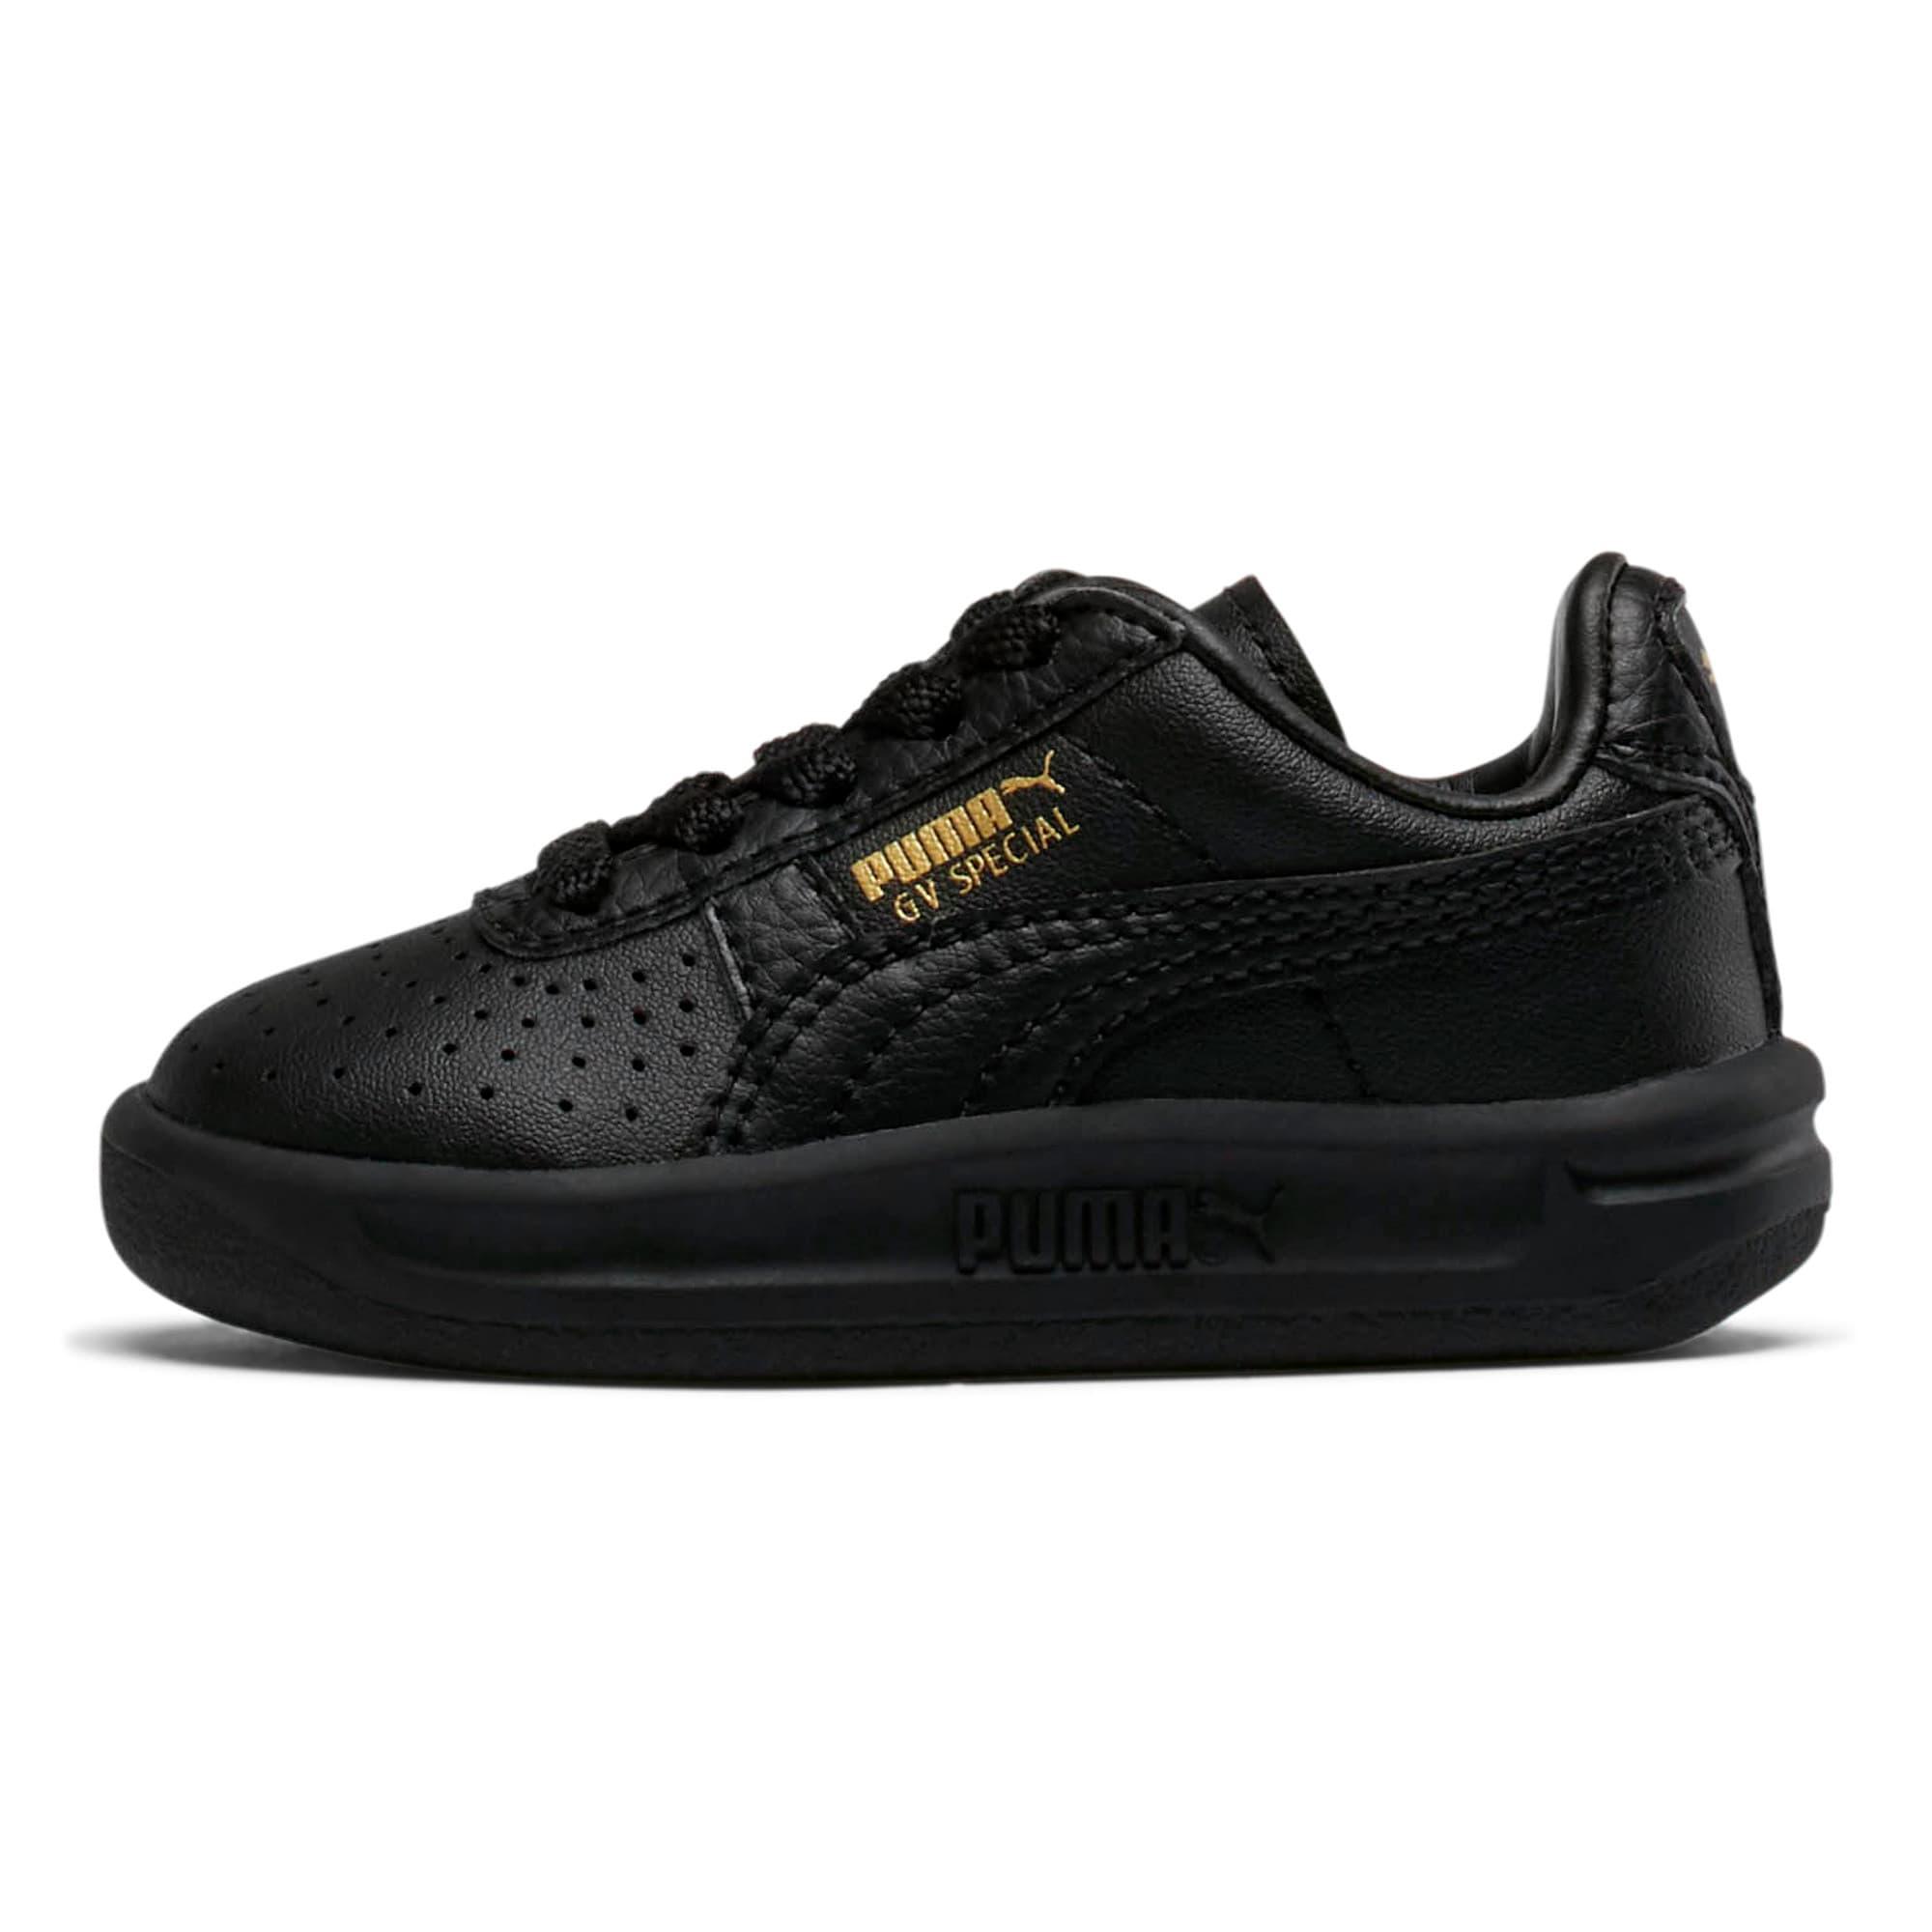 Thumbnail 1 of GV Special Toddler Shoes, Puma Black-Puma Team Gold, medium